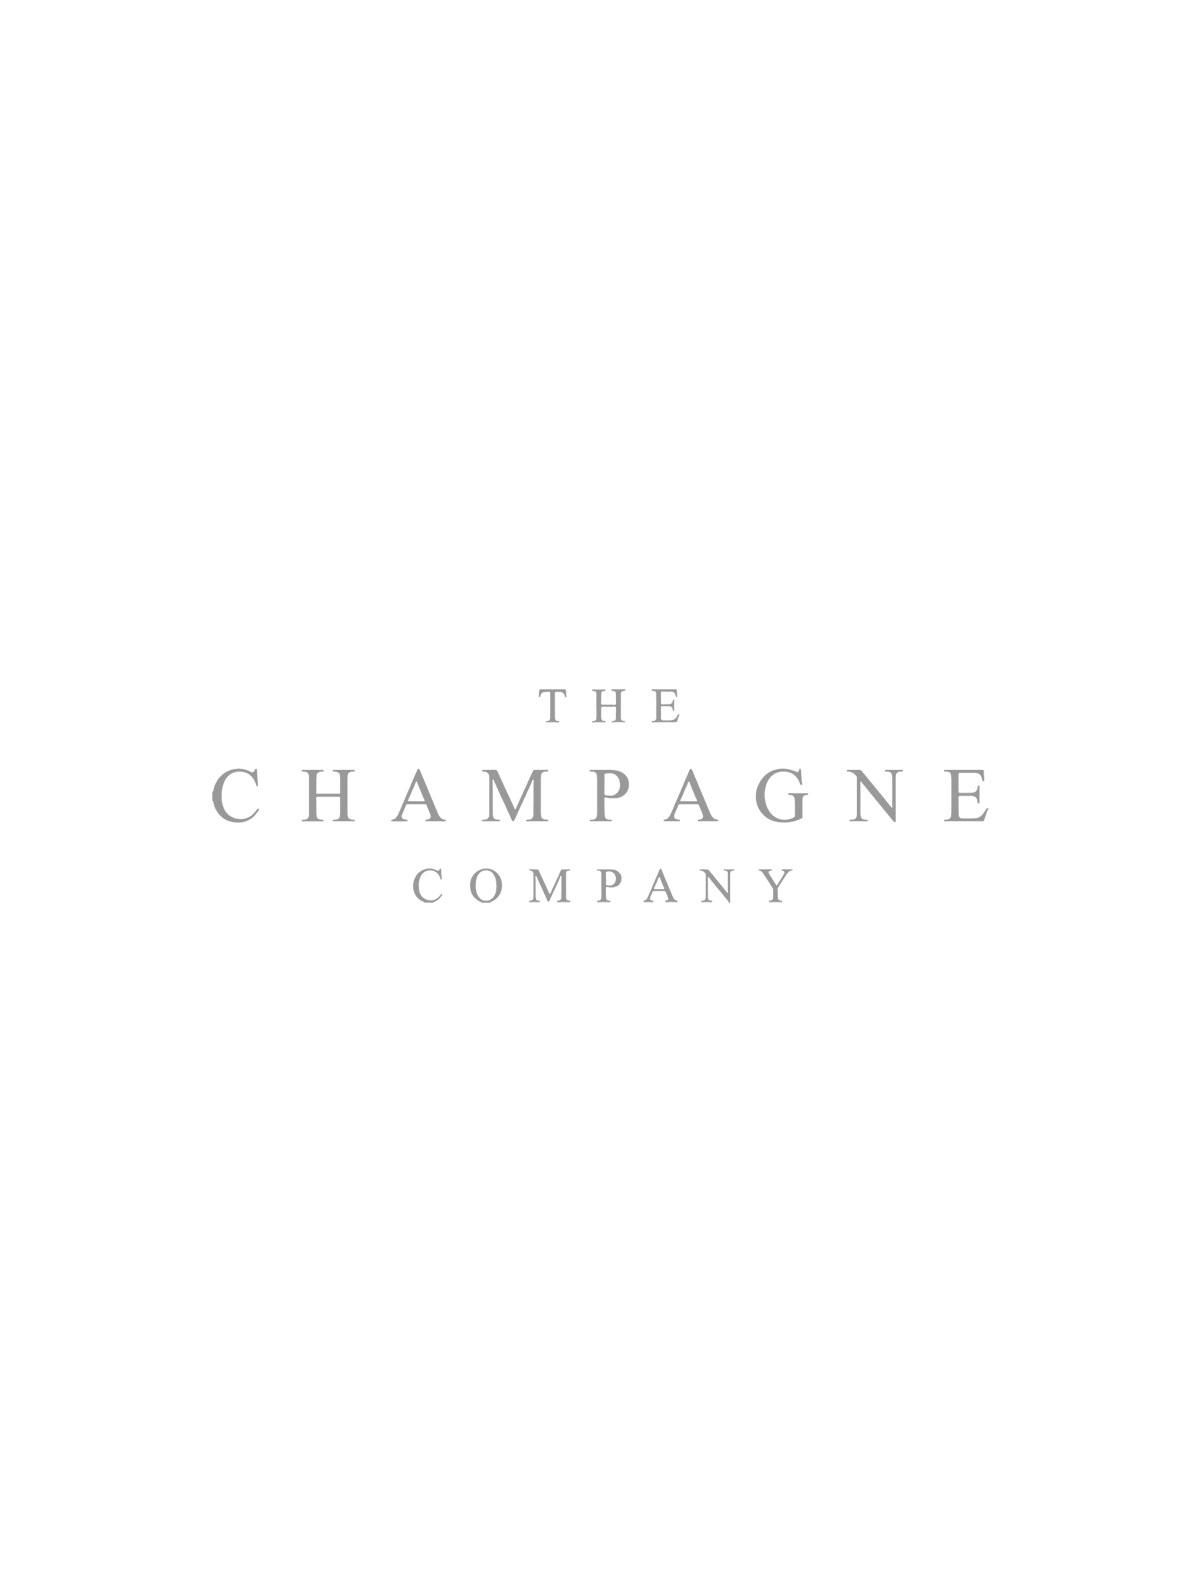 Lacourte-Godbillon Mi-Pentes 1er Cru Champagne 75cl